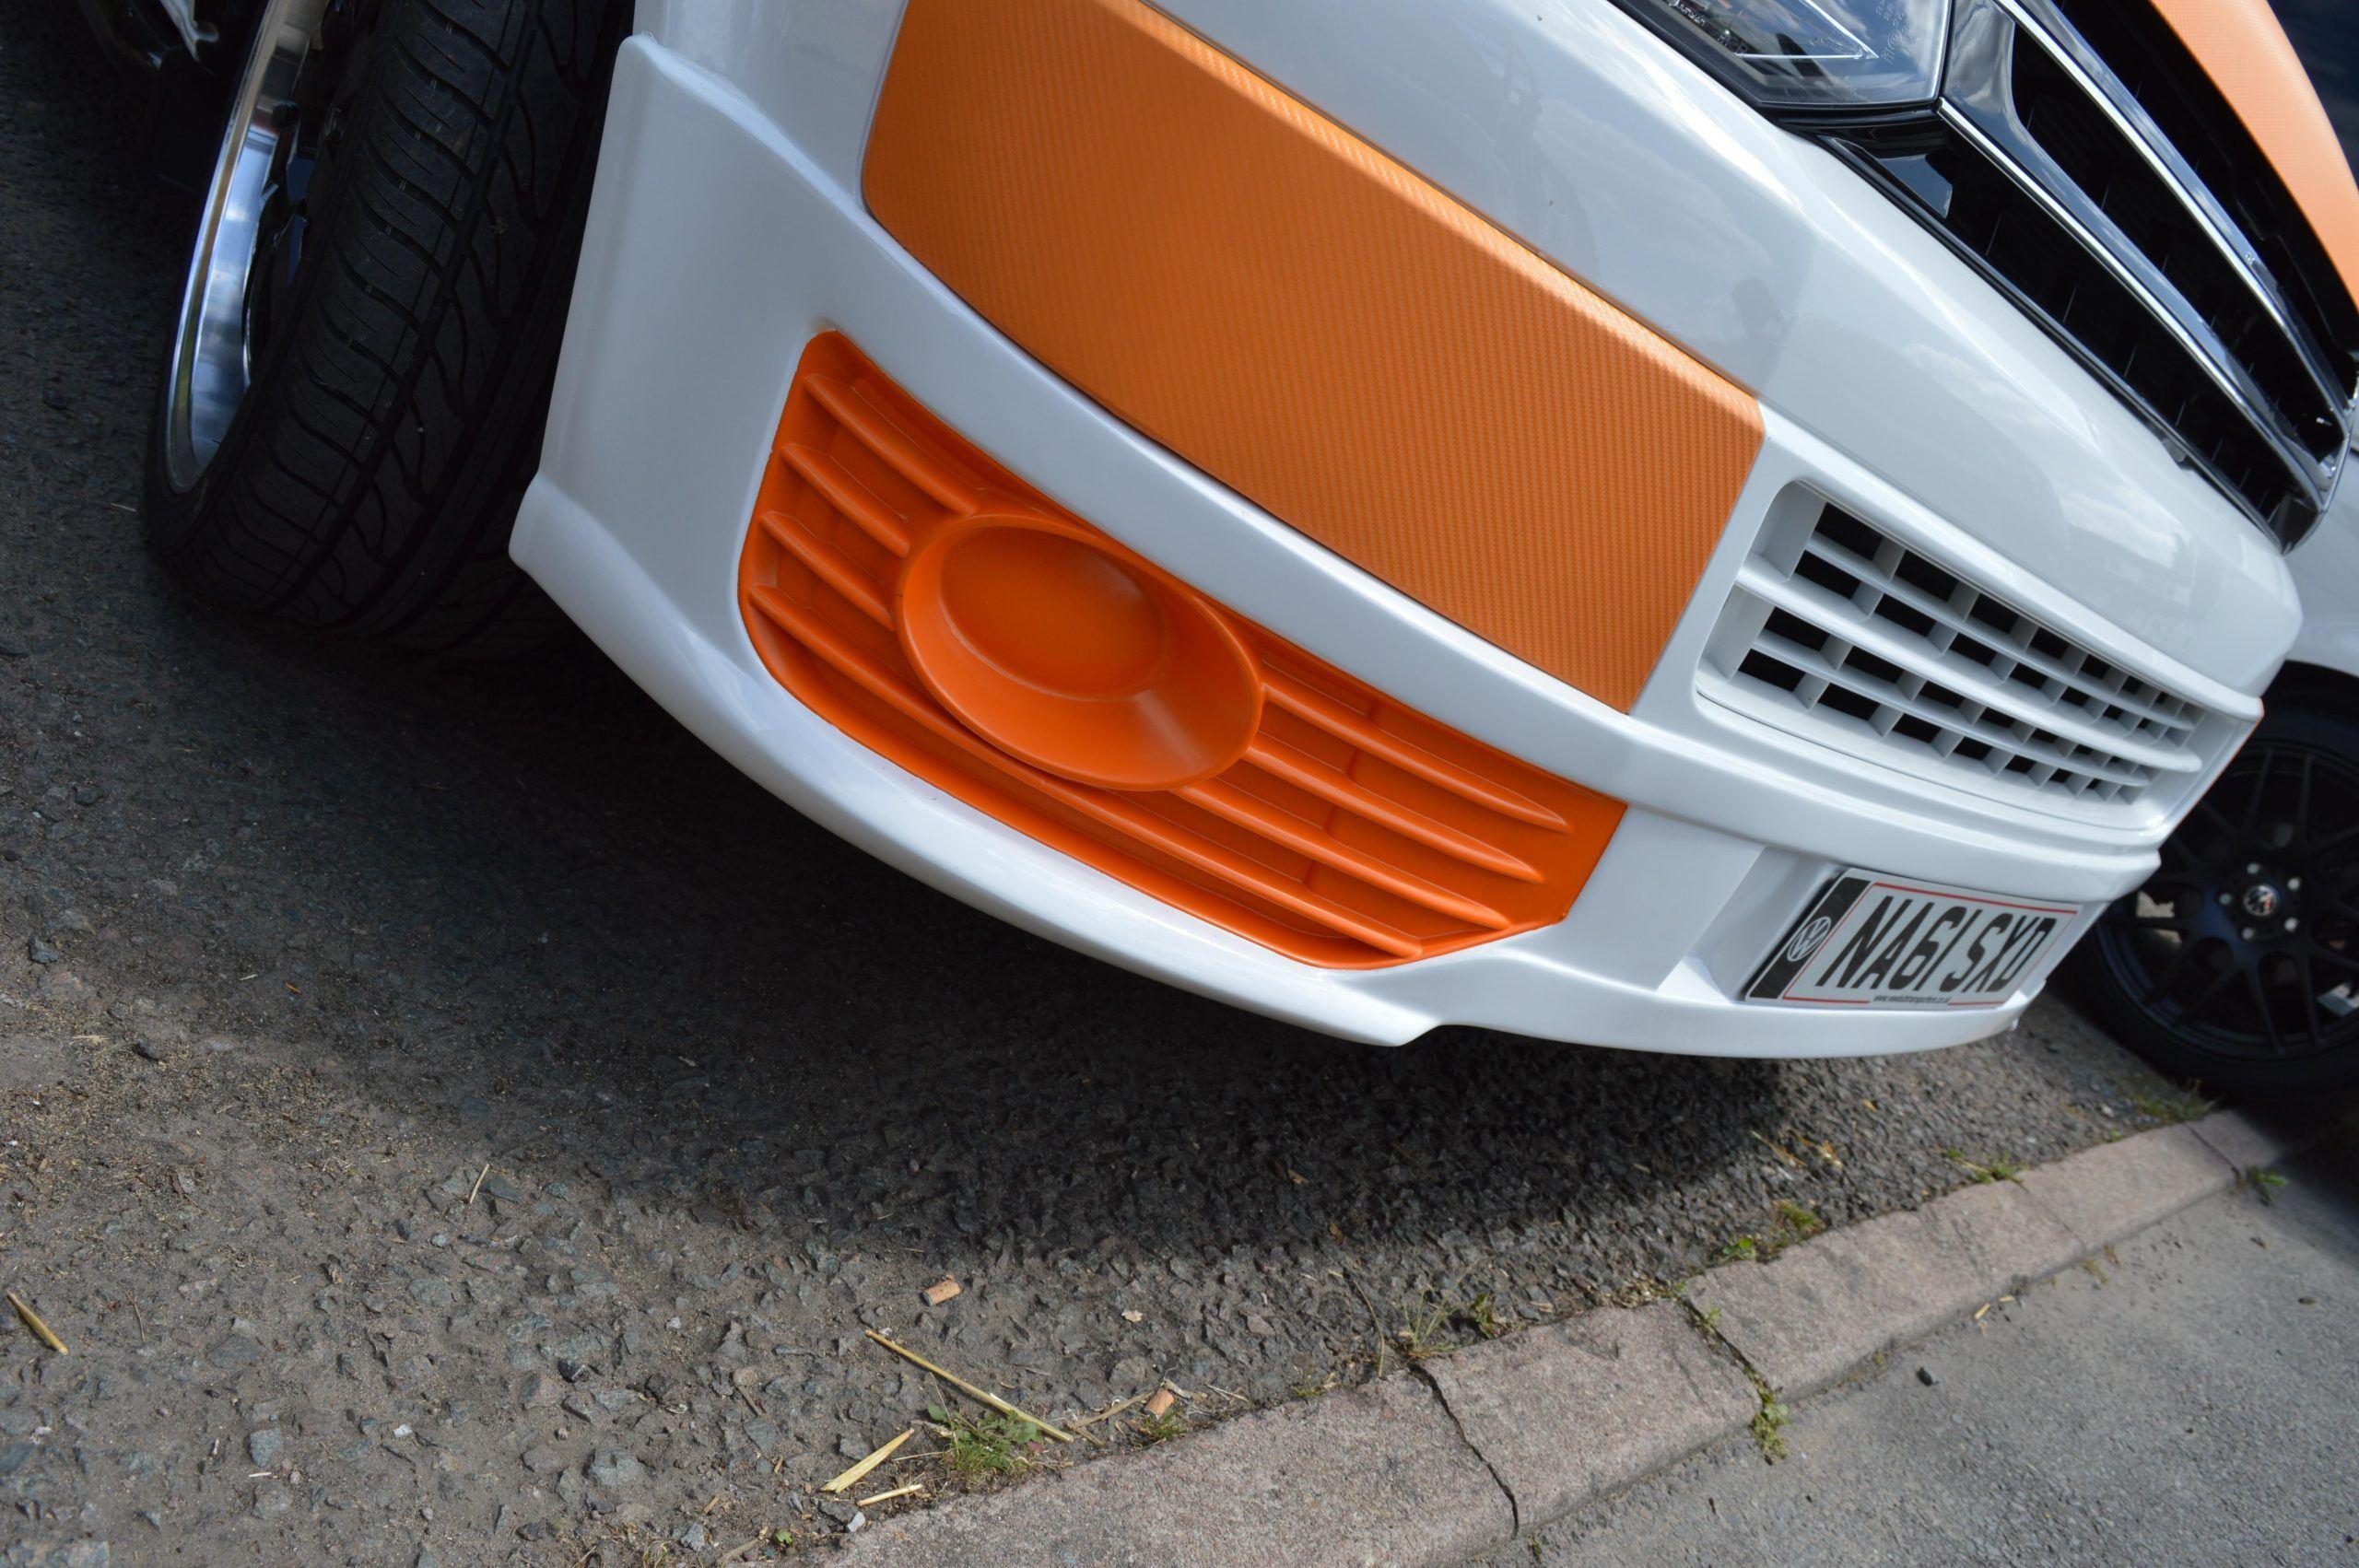 Vw Transporter T5.1 Gp Sportline Style Front Spoiler